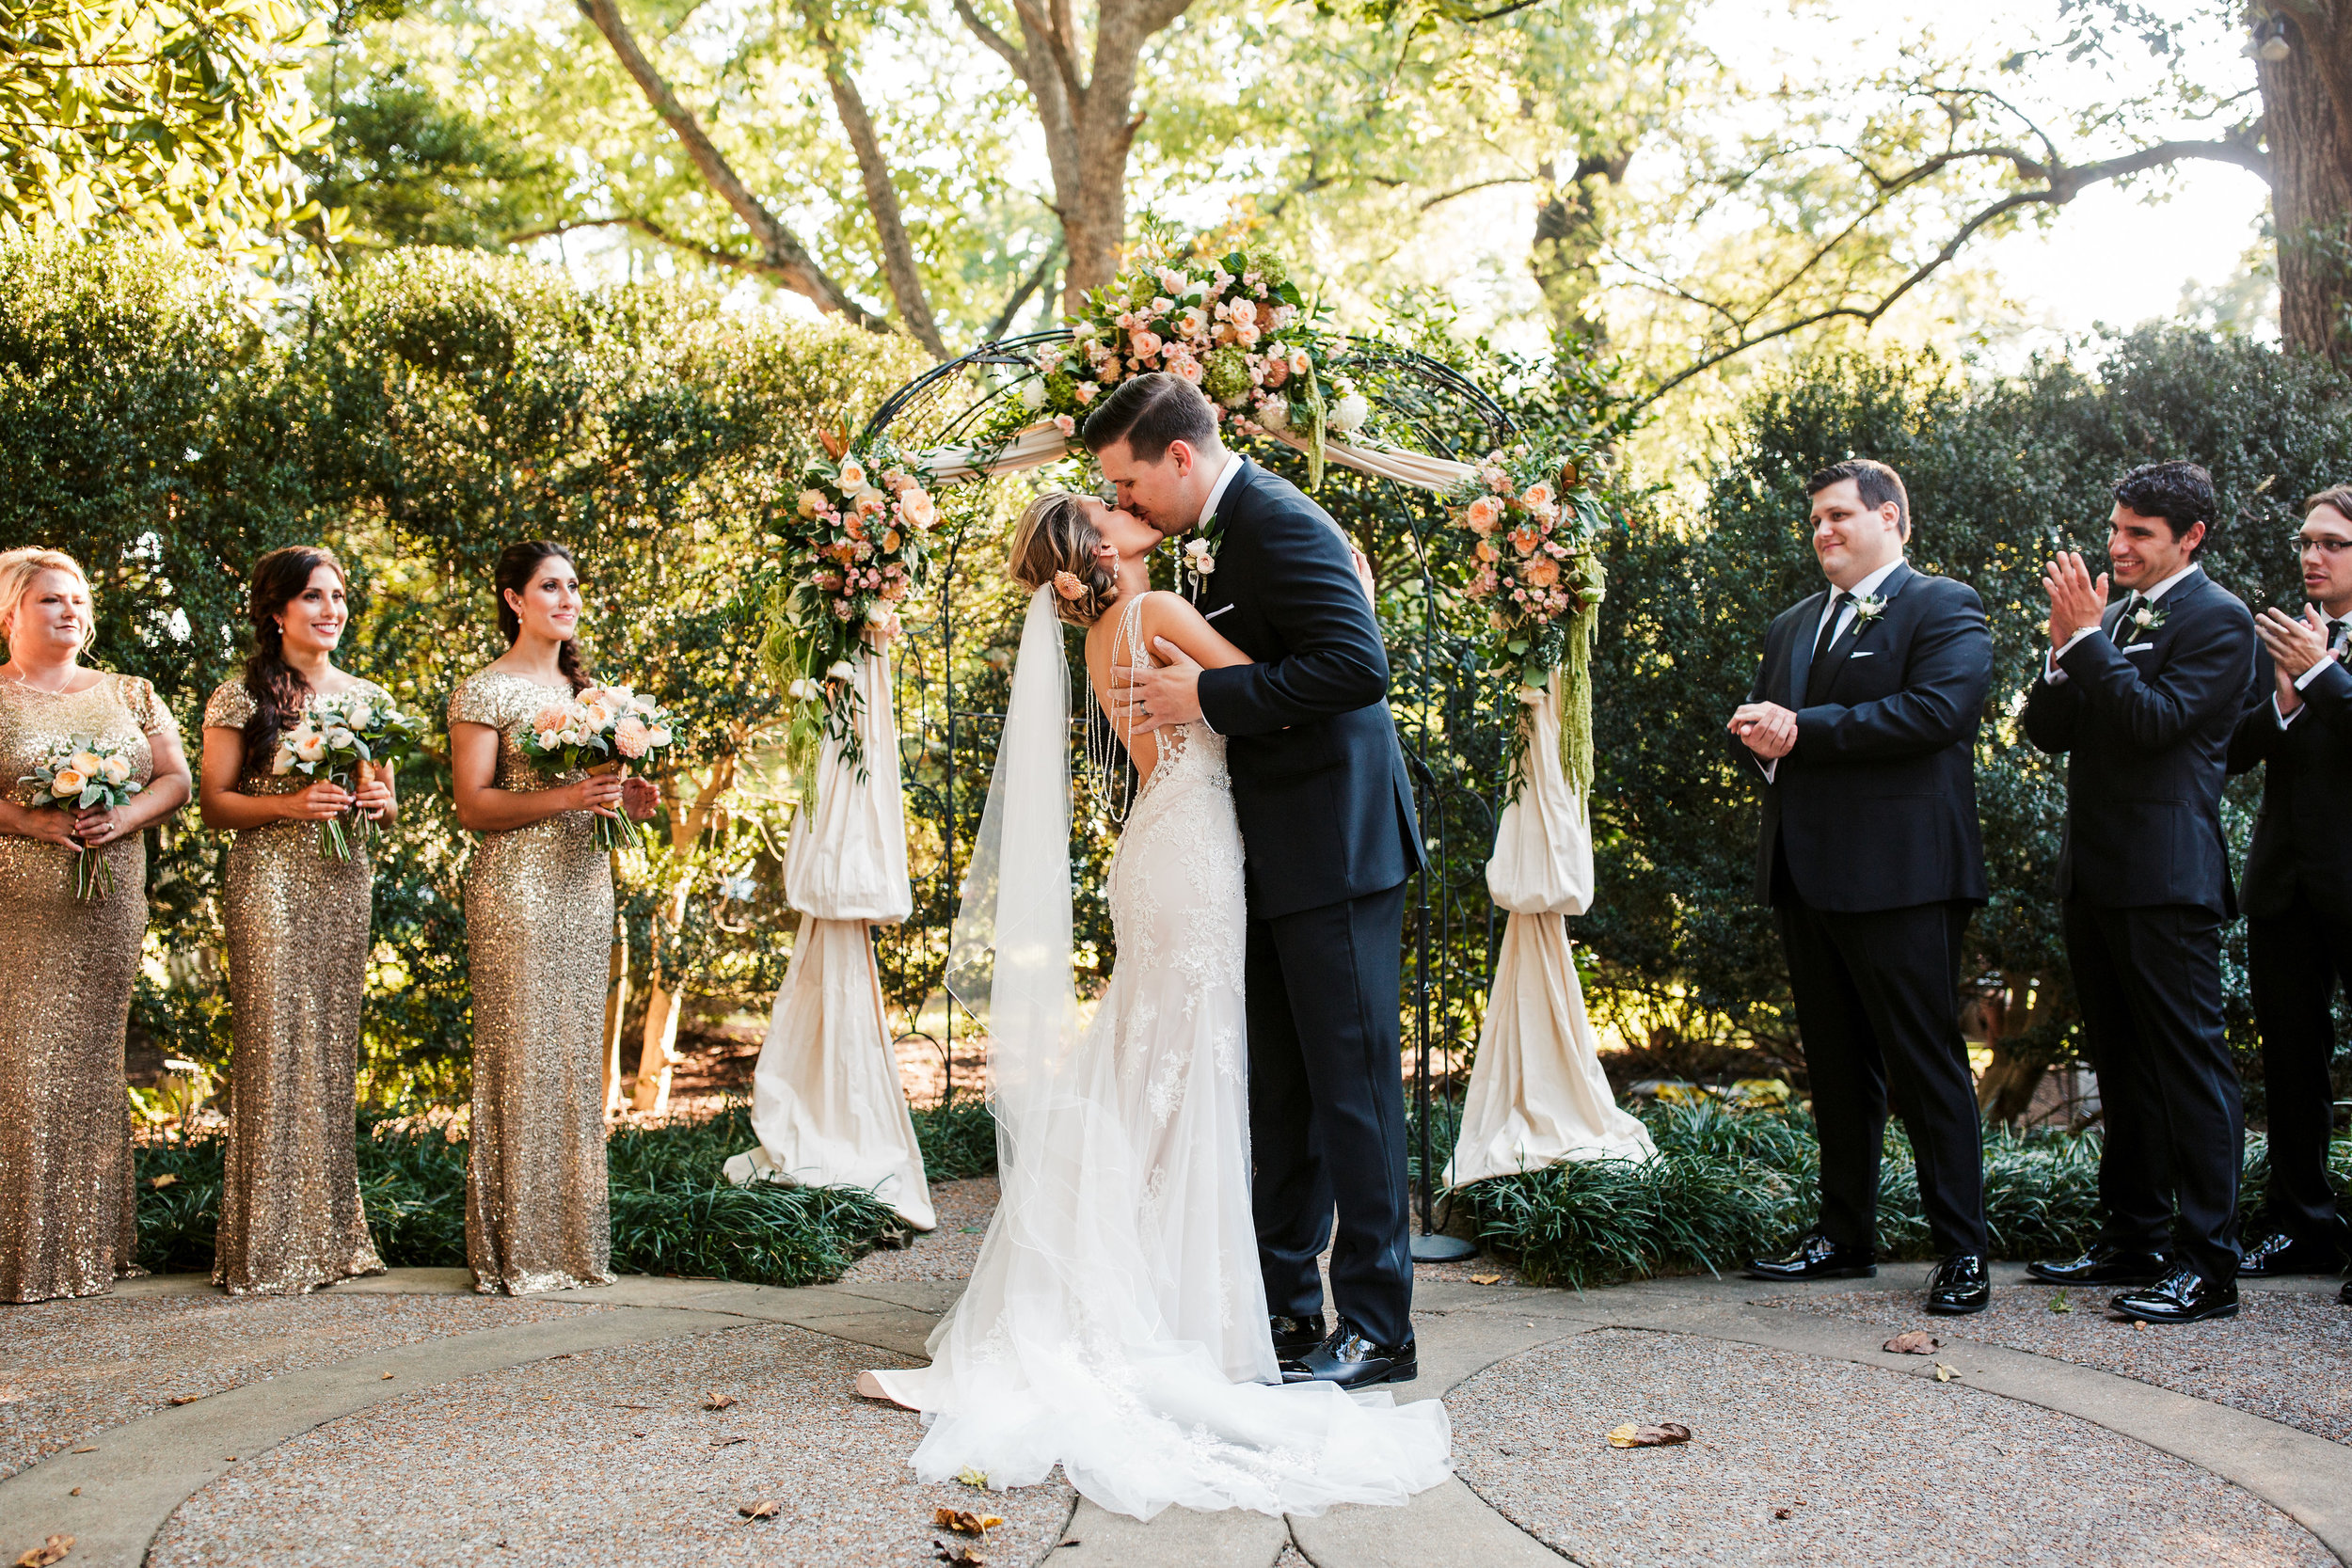 Riverwood-Mansion-Wedding14.jpg